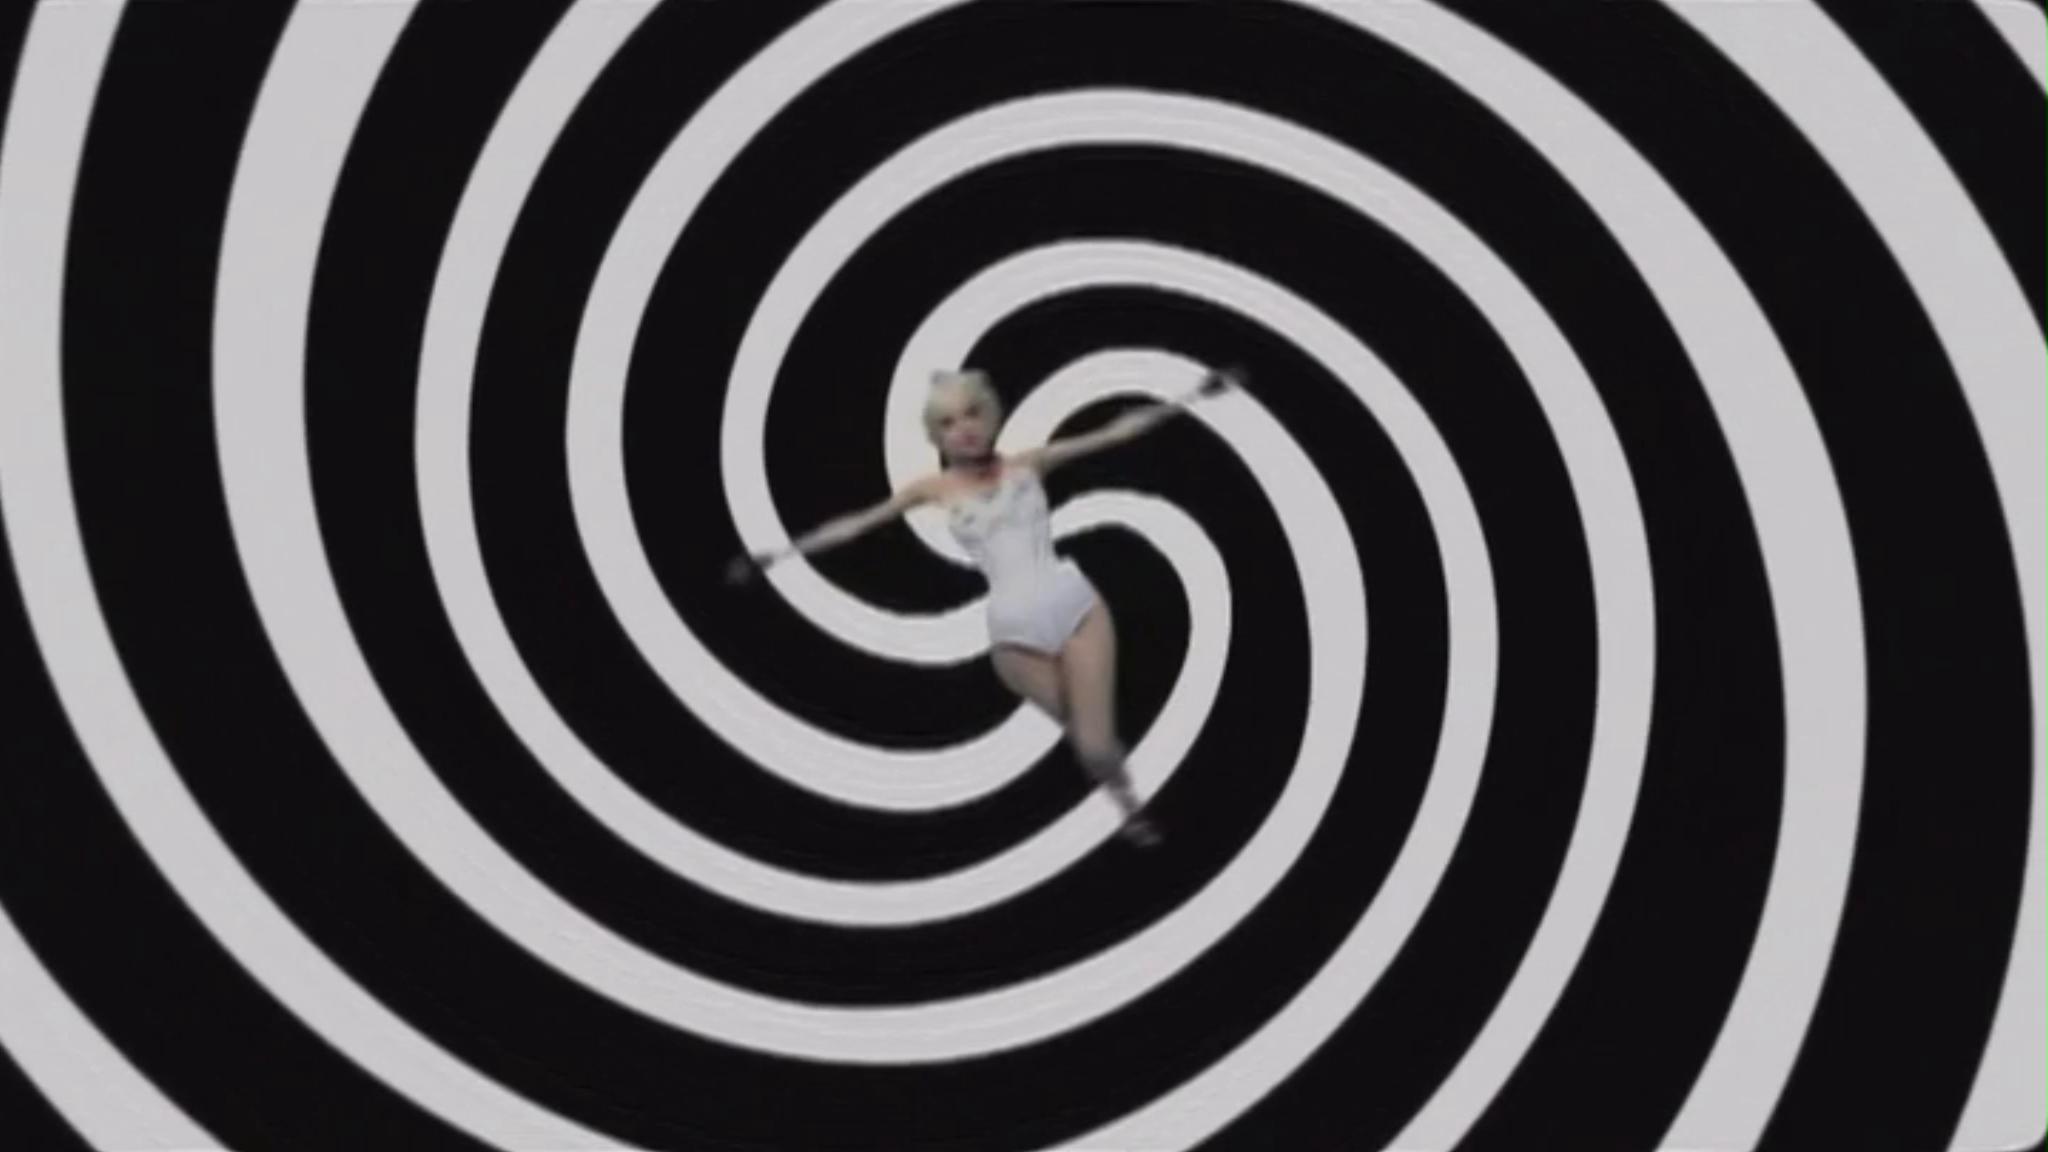 Lady Gaga - Paparazzi 音楽 Video - Screencaps